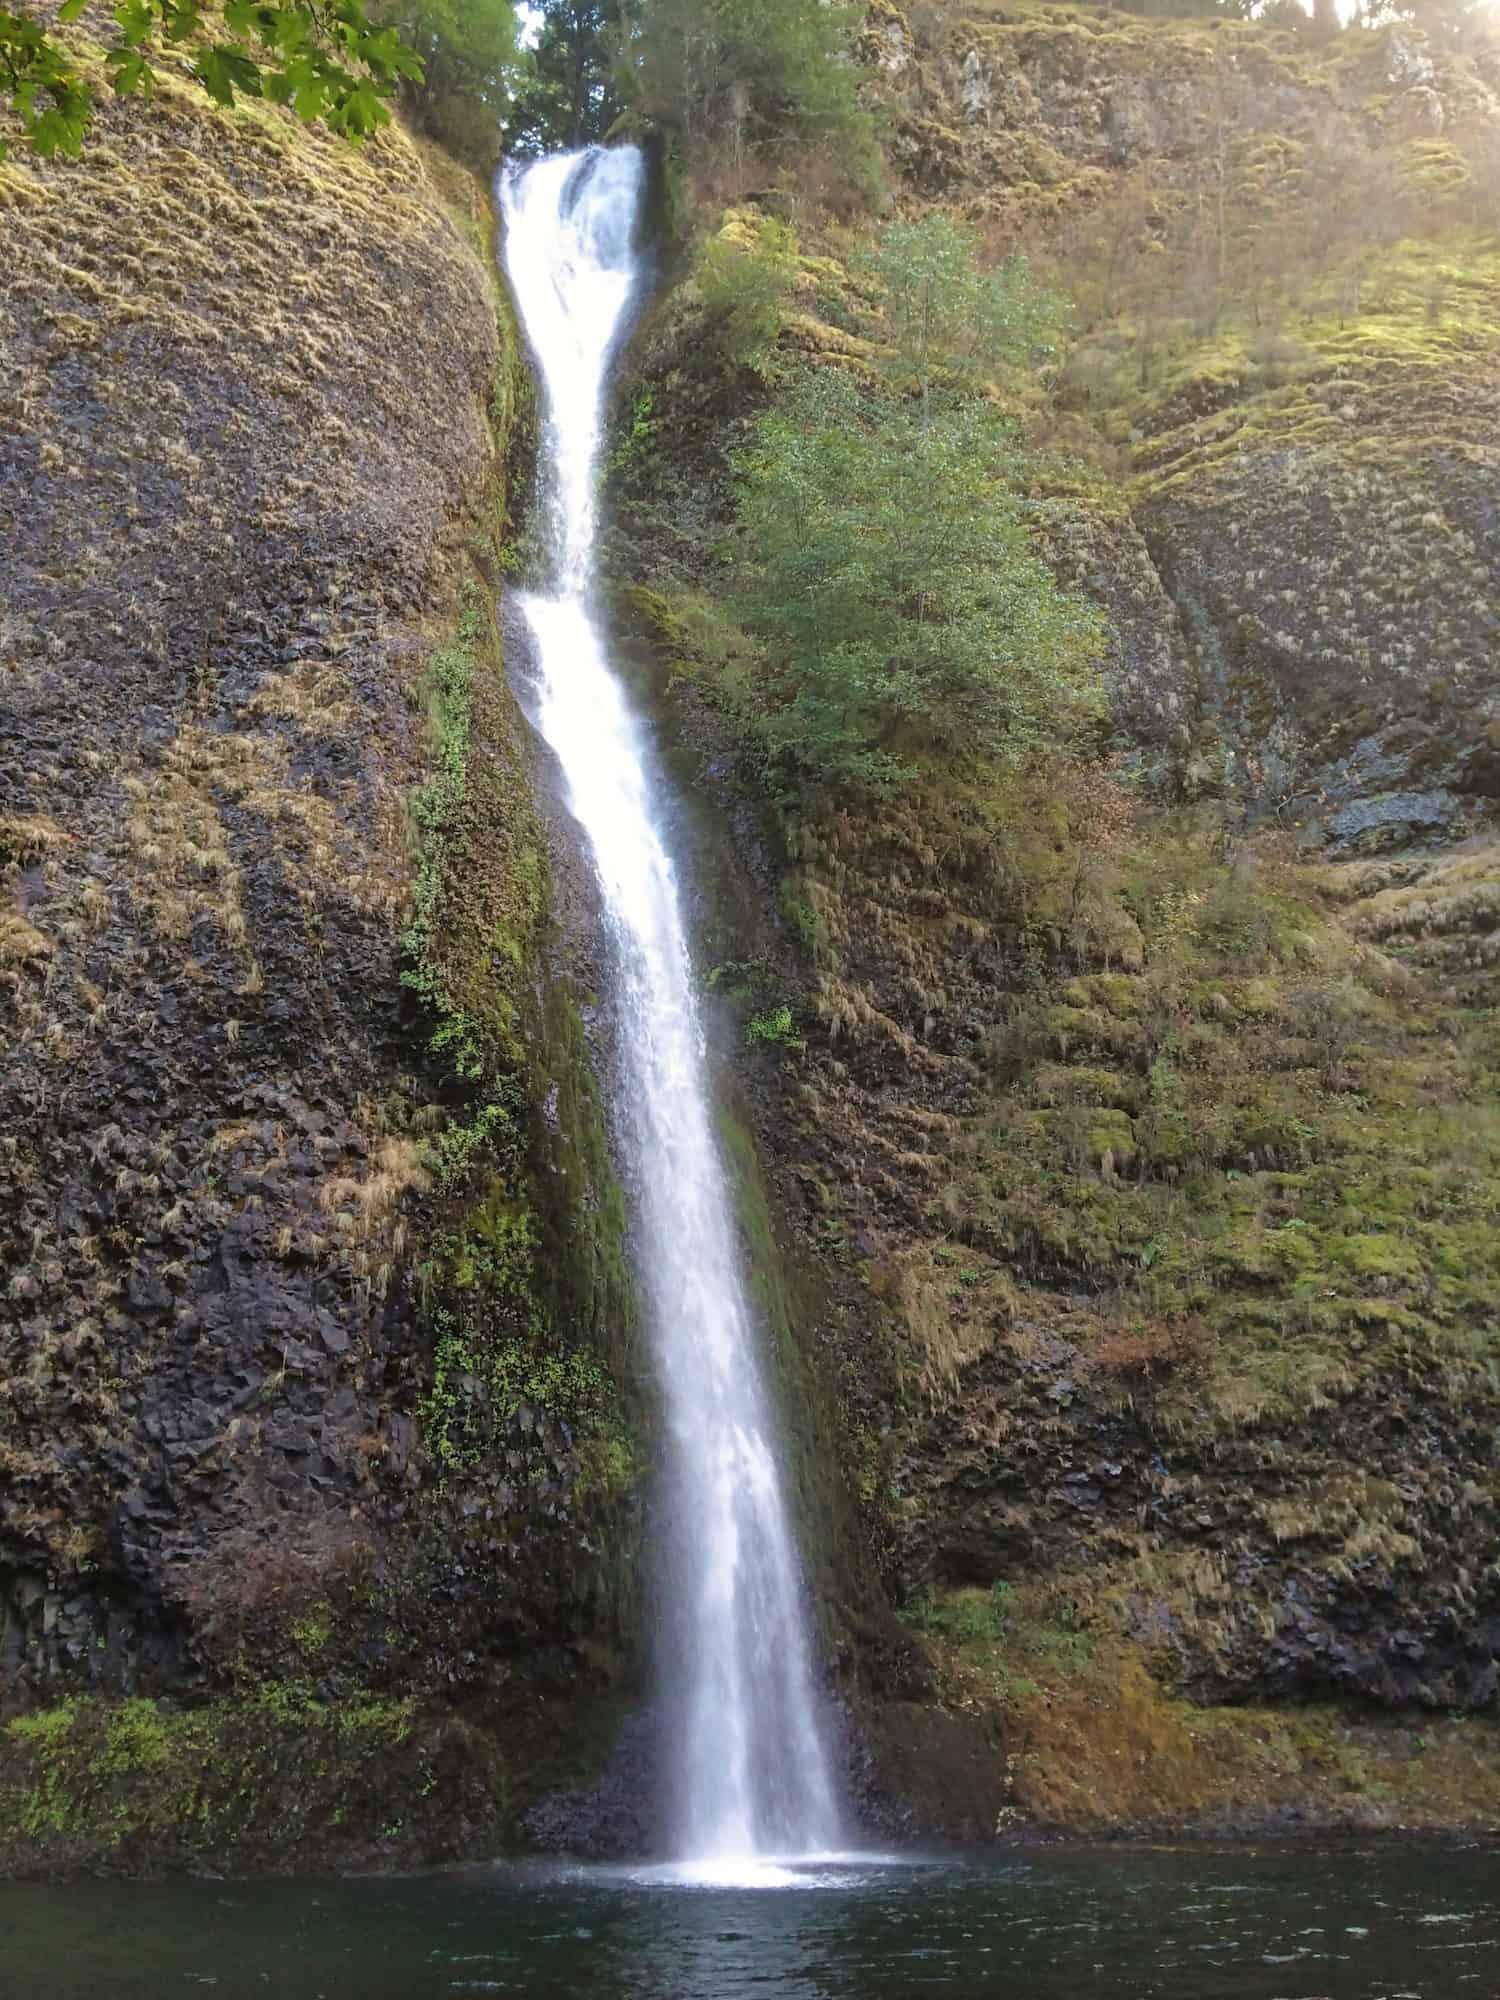 Portland Weekend Trip - Multnomah Falls Day Trip